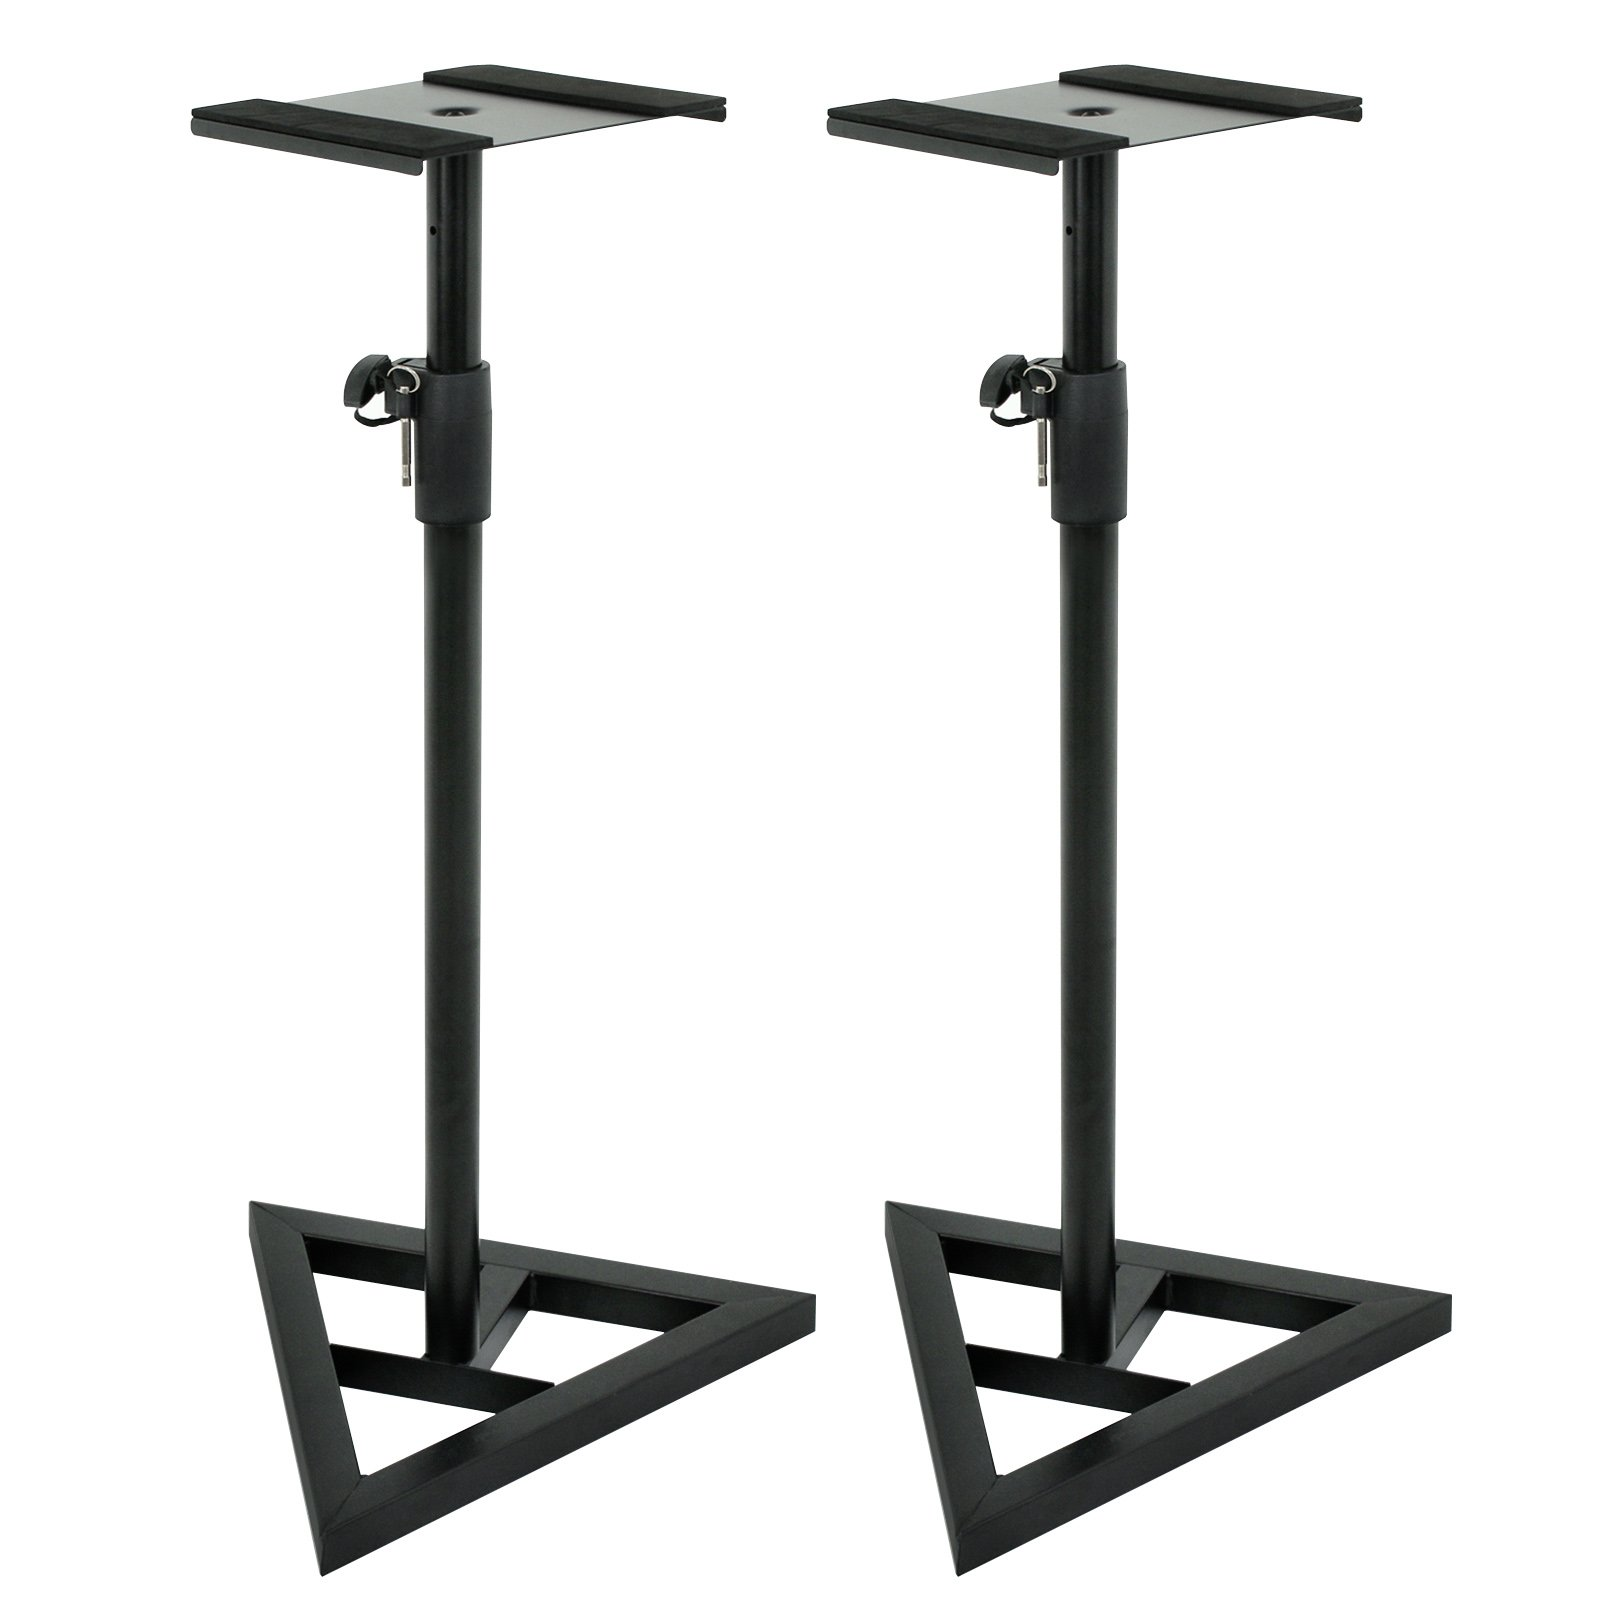 ZENY Pair of Studio Monitor Speaker Stands Height Adjustable Concert Band DJ Studio Floor Stands w/Stable Triangle Base, Black by ZENY